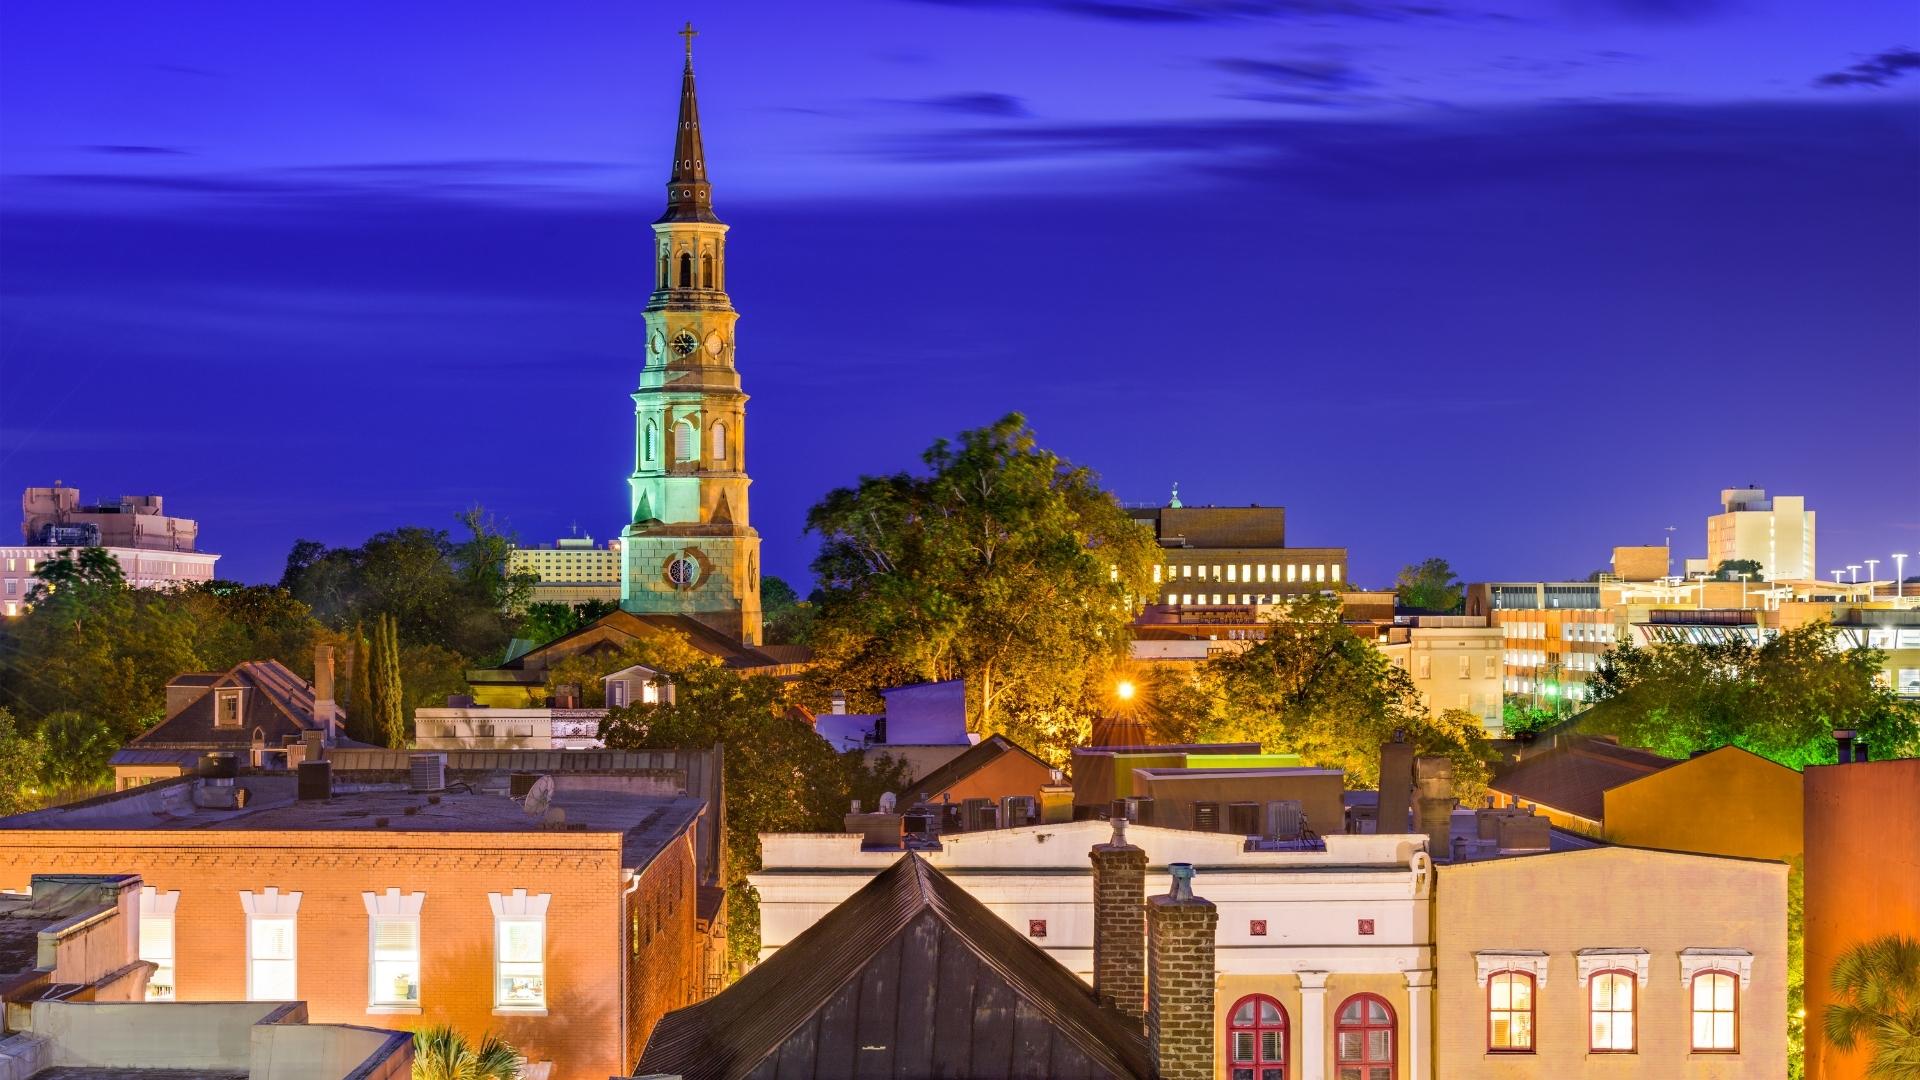 Charleston SC Downtown at Night